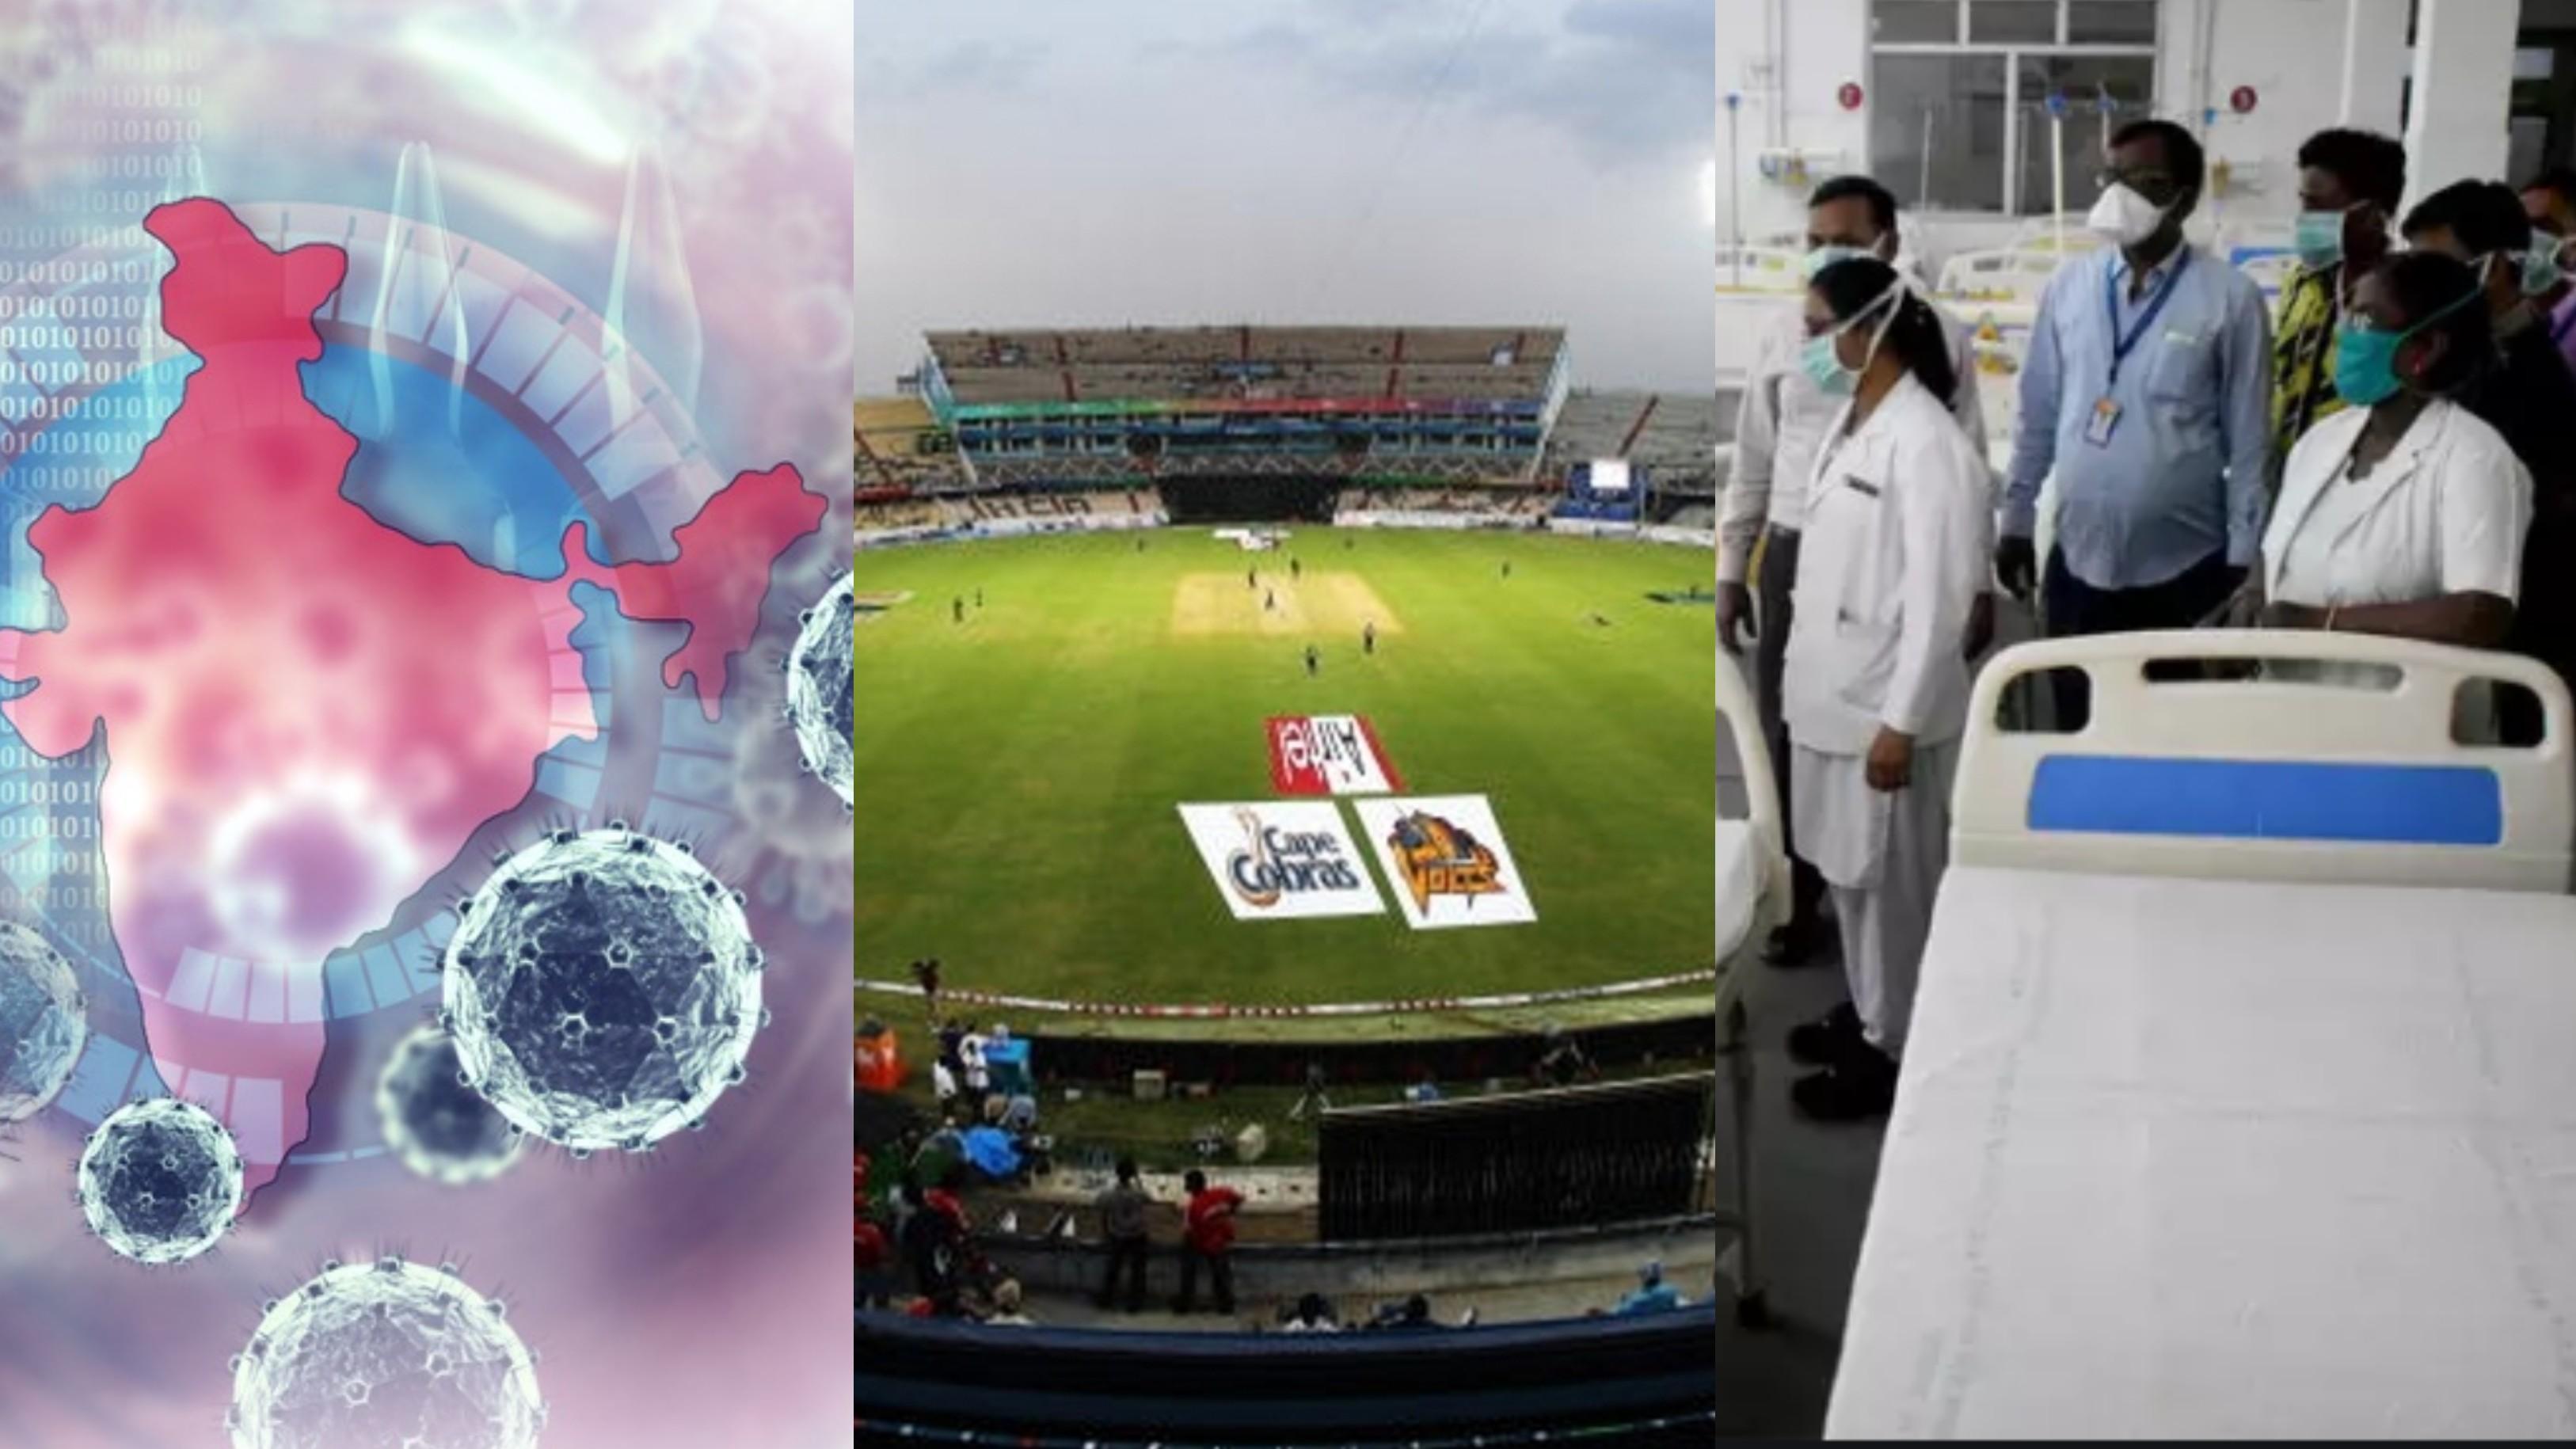 Hyderabad Cricket Association offers Rajiv Gandhi Stadium for setting up isolation center amid COVID-19 crisis